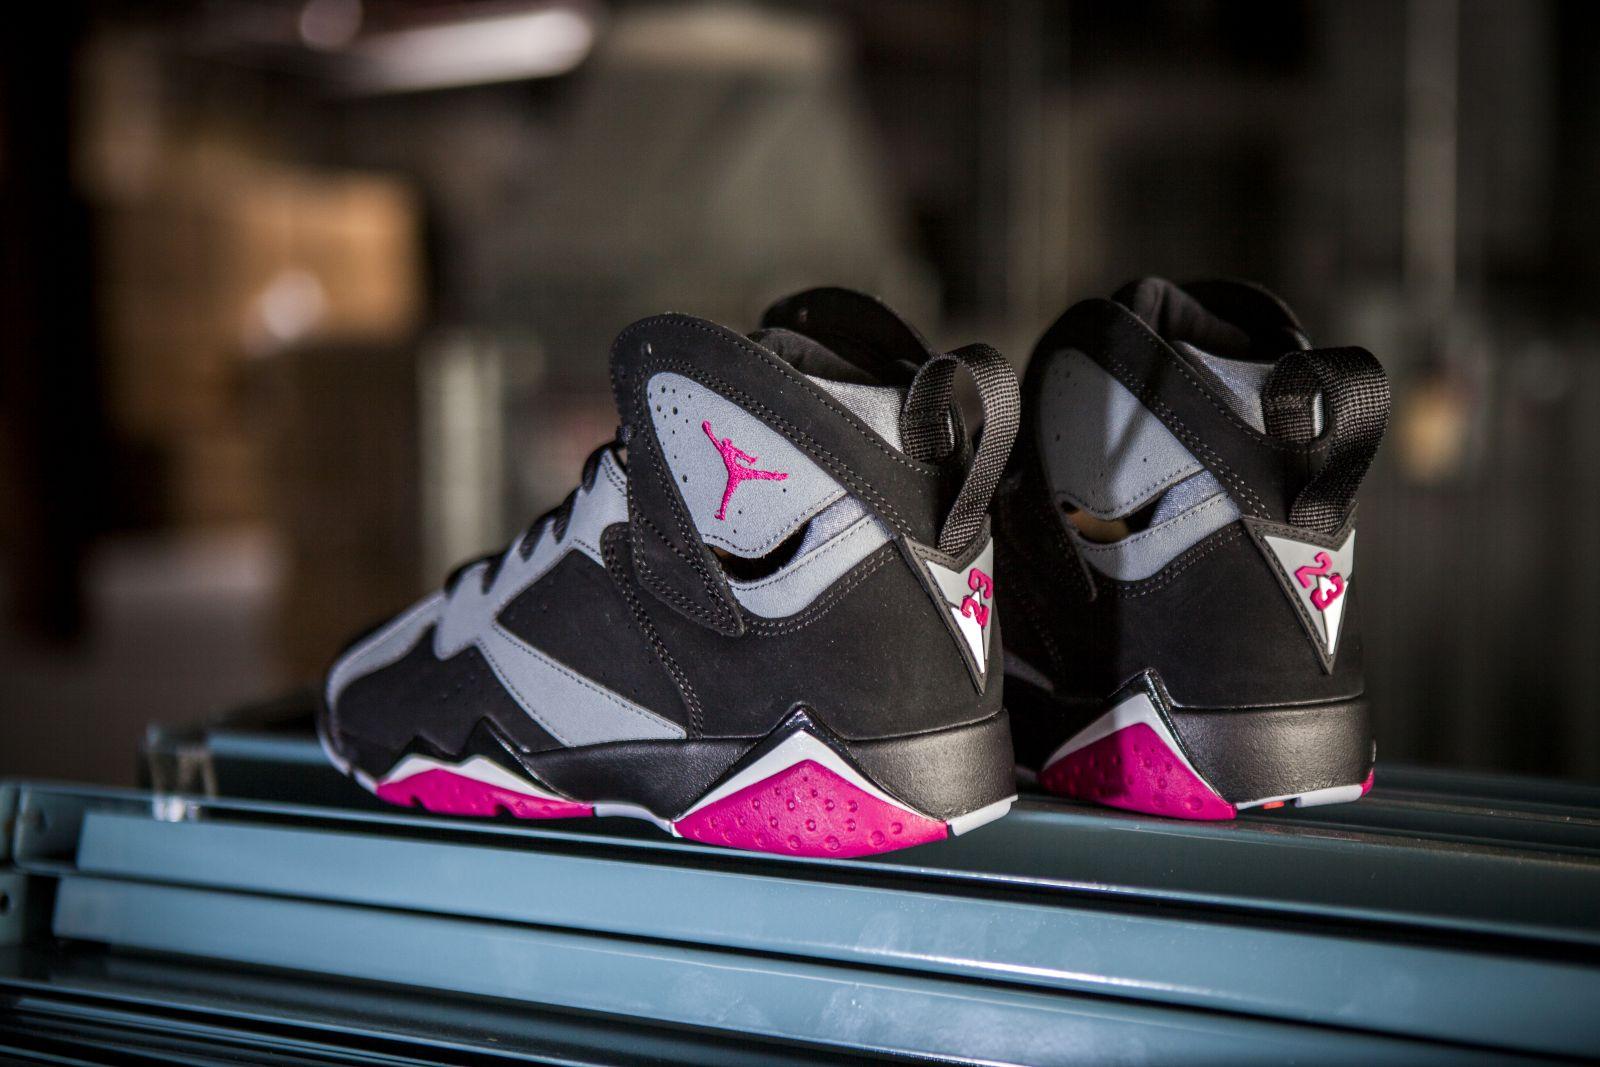 6efd72b9aa33a0 Air Jordan 7 GG Release Date  08 08 15. Color  Black Sport Fuchsia-Cool  Grey-Wolf Grey Style    442960-008. Price   140